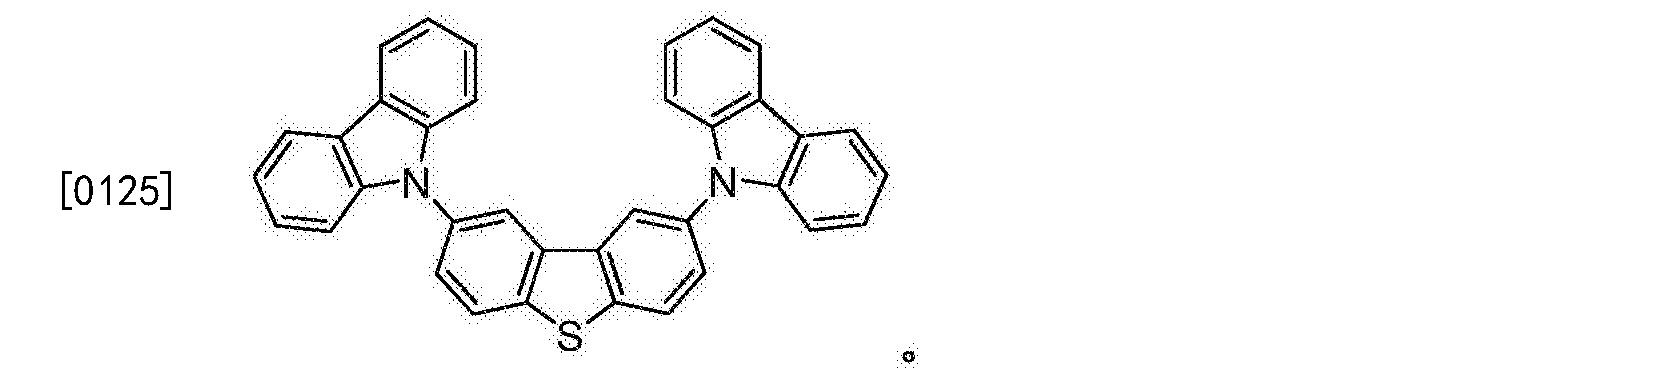 Figure CN106749425AD00662